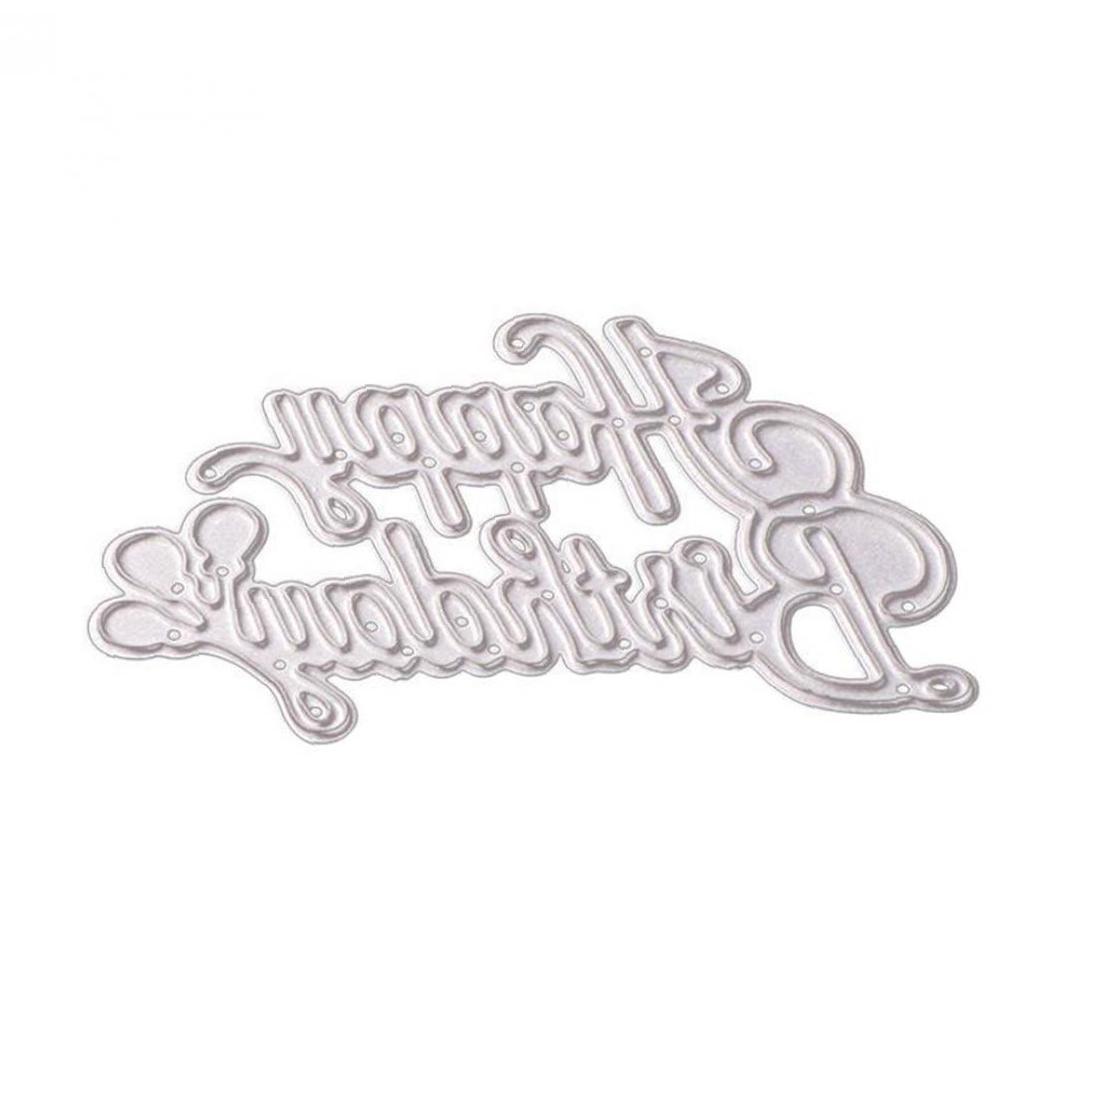 Happy Birthday Shape Cutting Dies Metal Stencil Template For DIY Album Scrapbook Halloween Christmas Thanksgiving Decoration